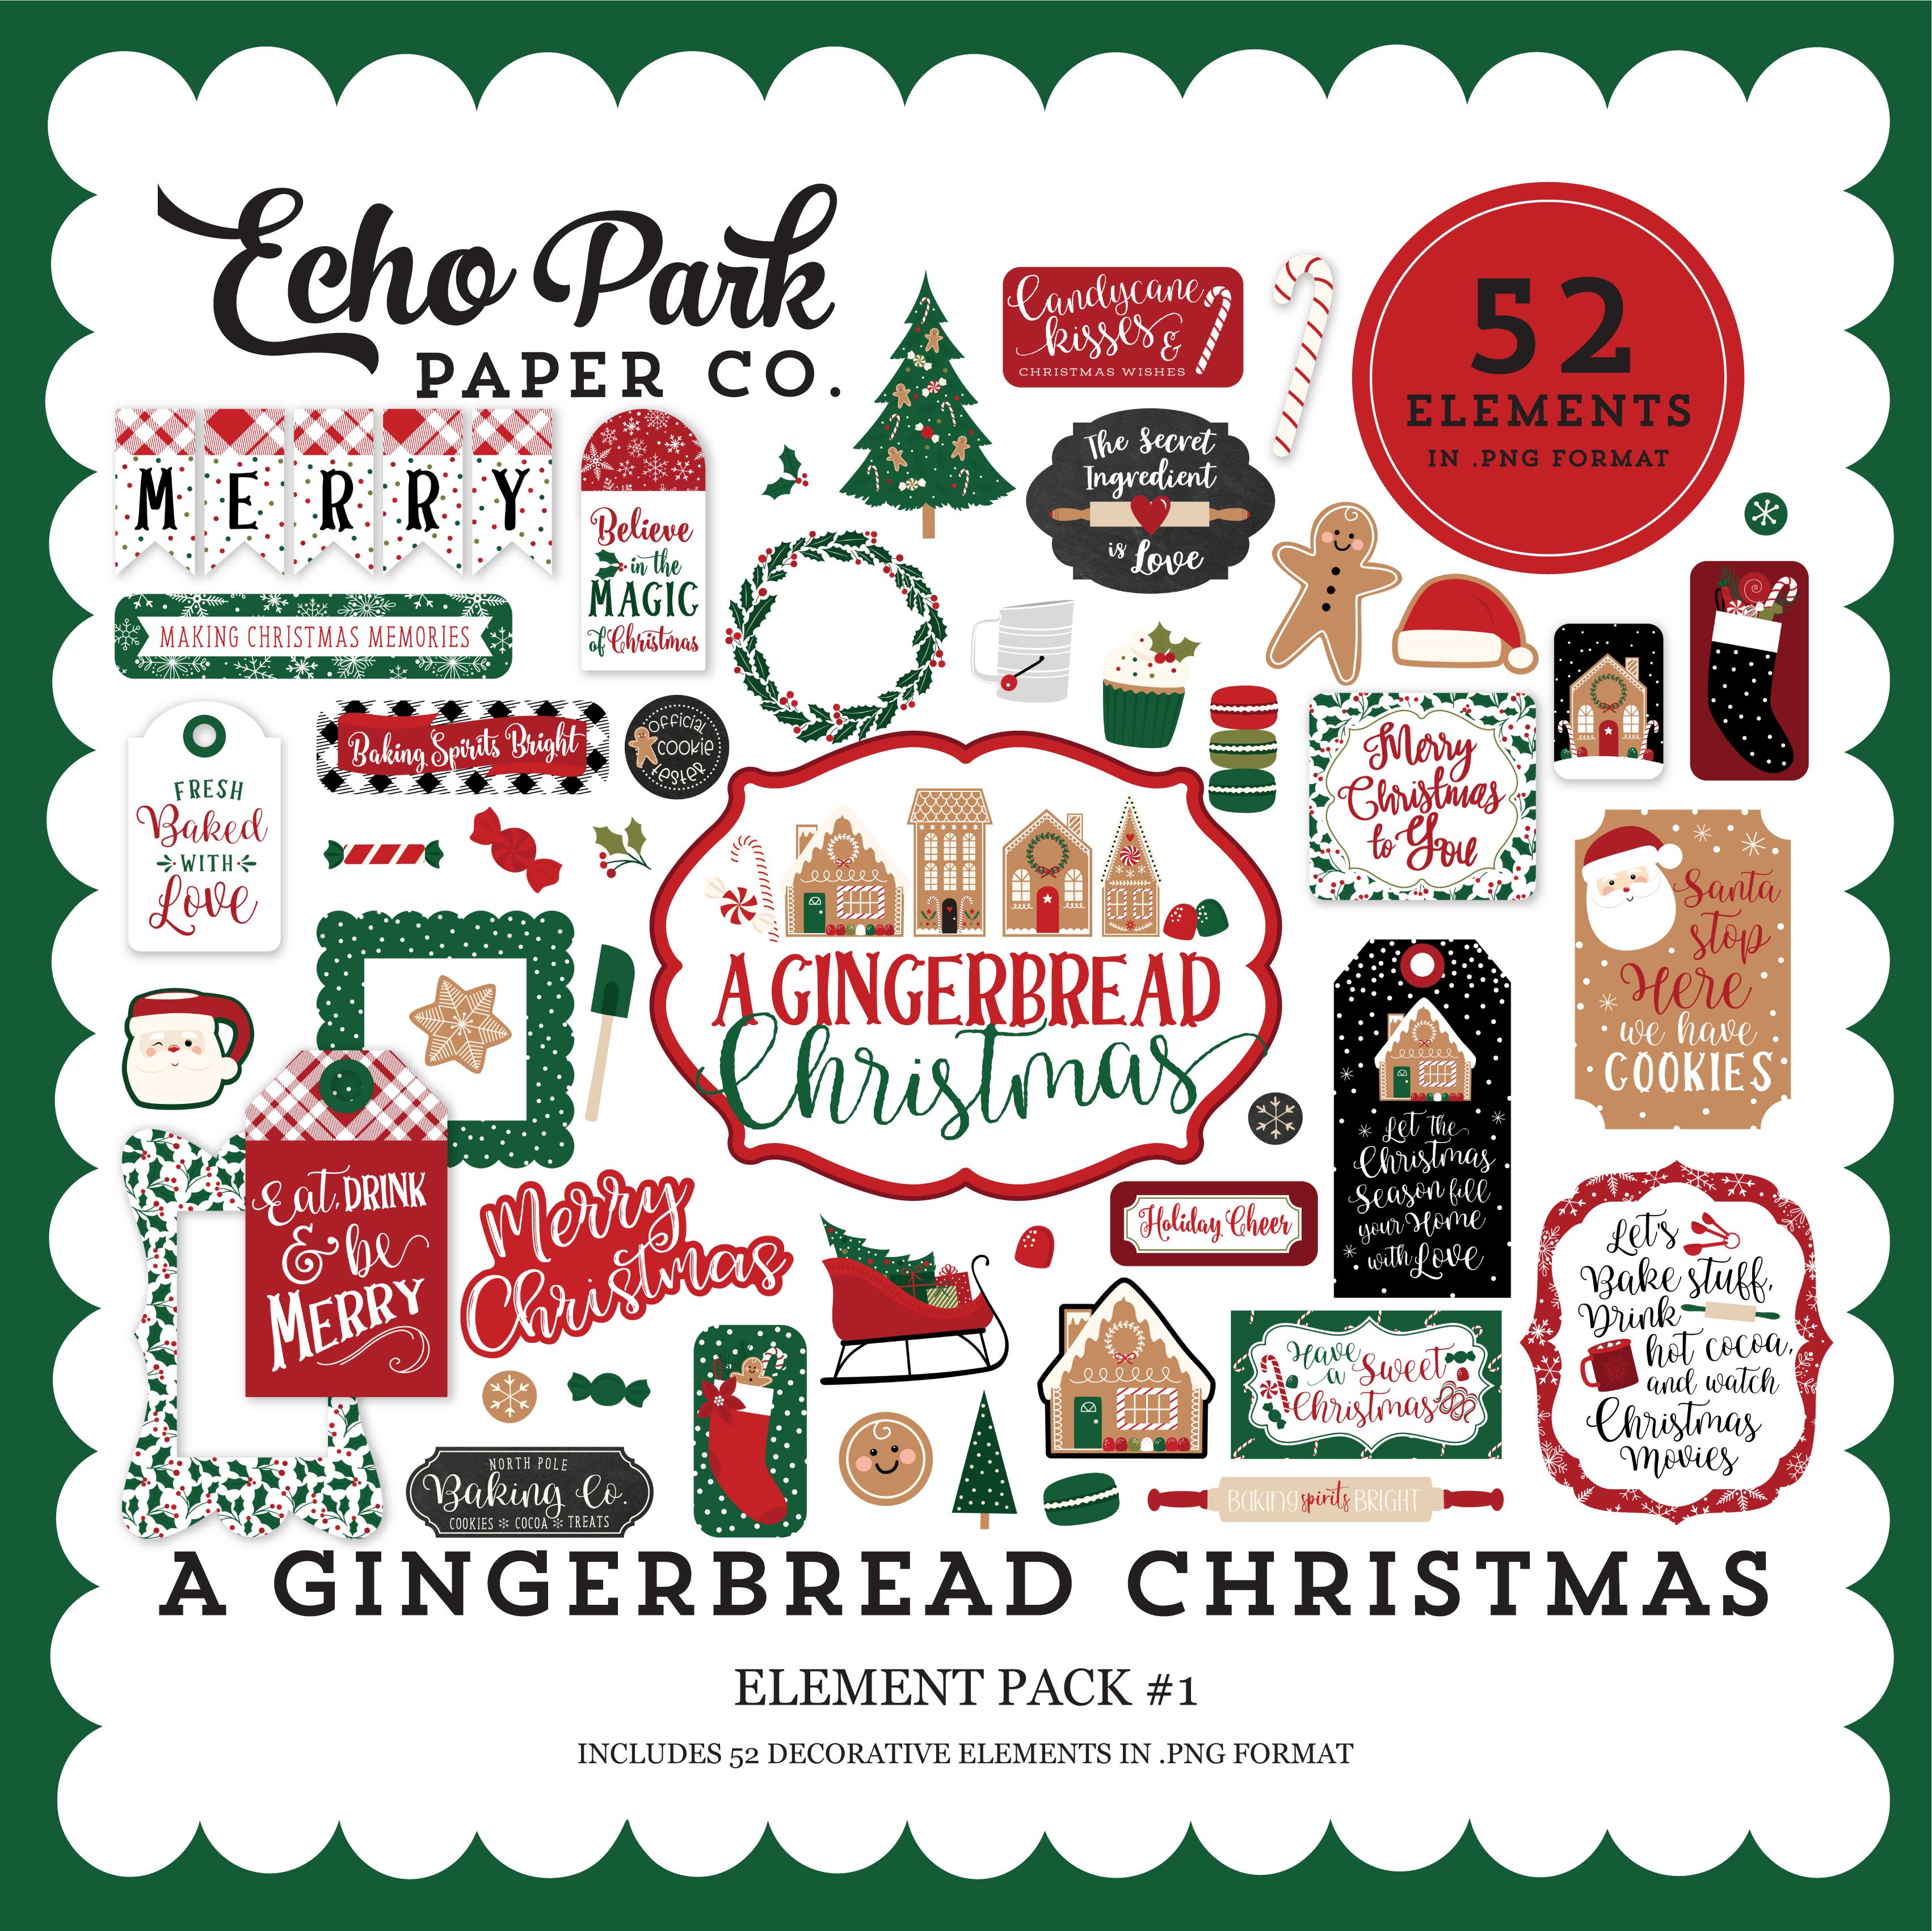 A Gingerbread Christmas Mega Collection